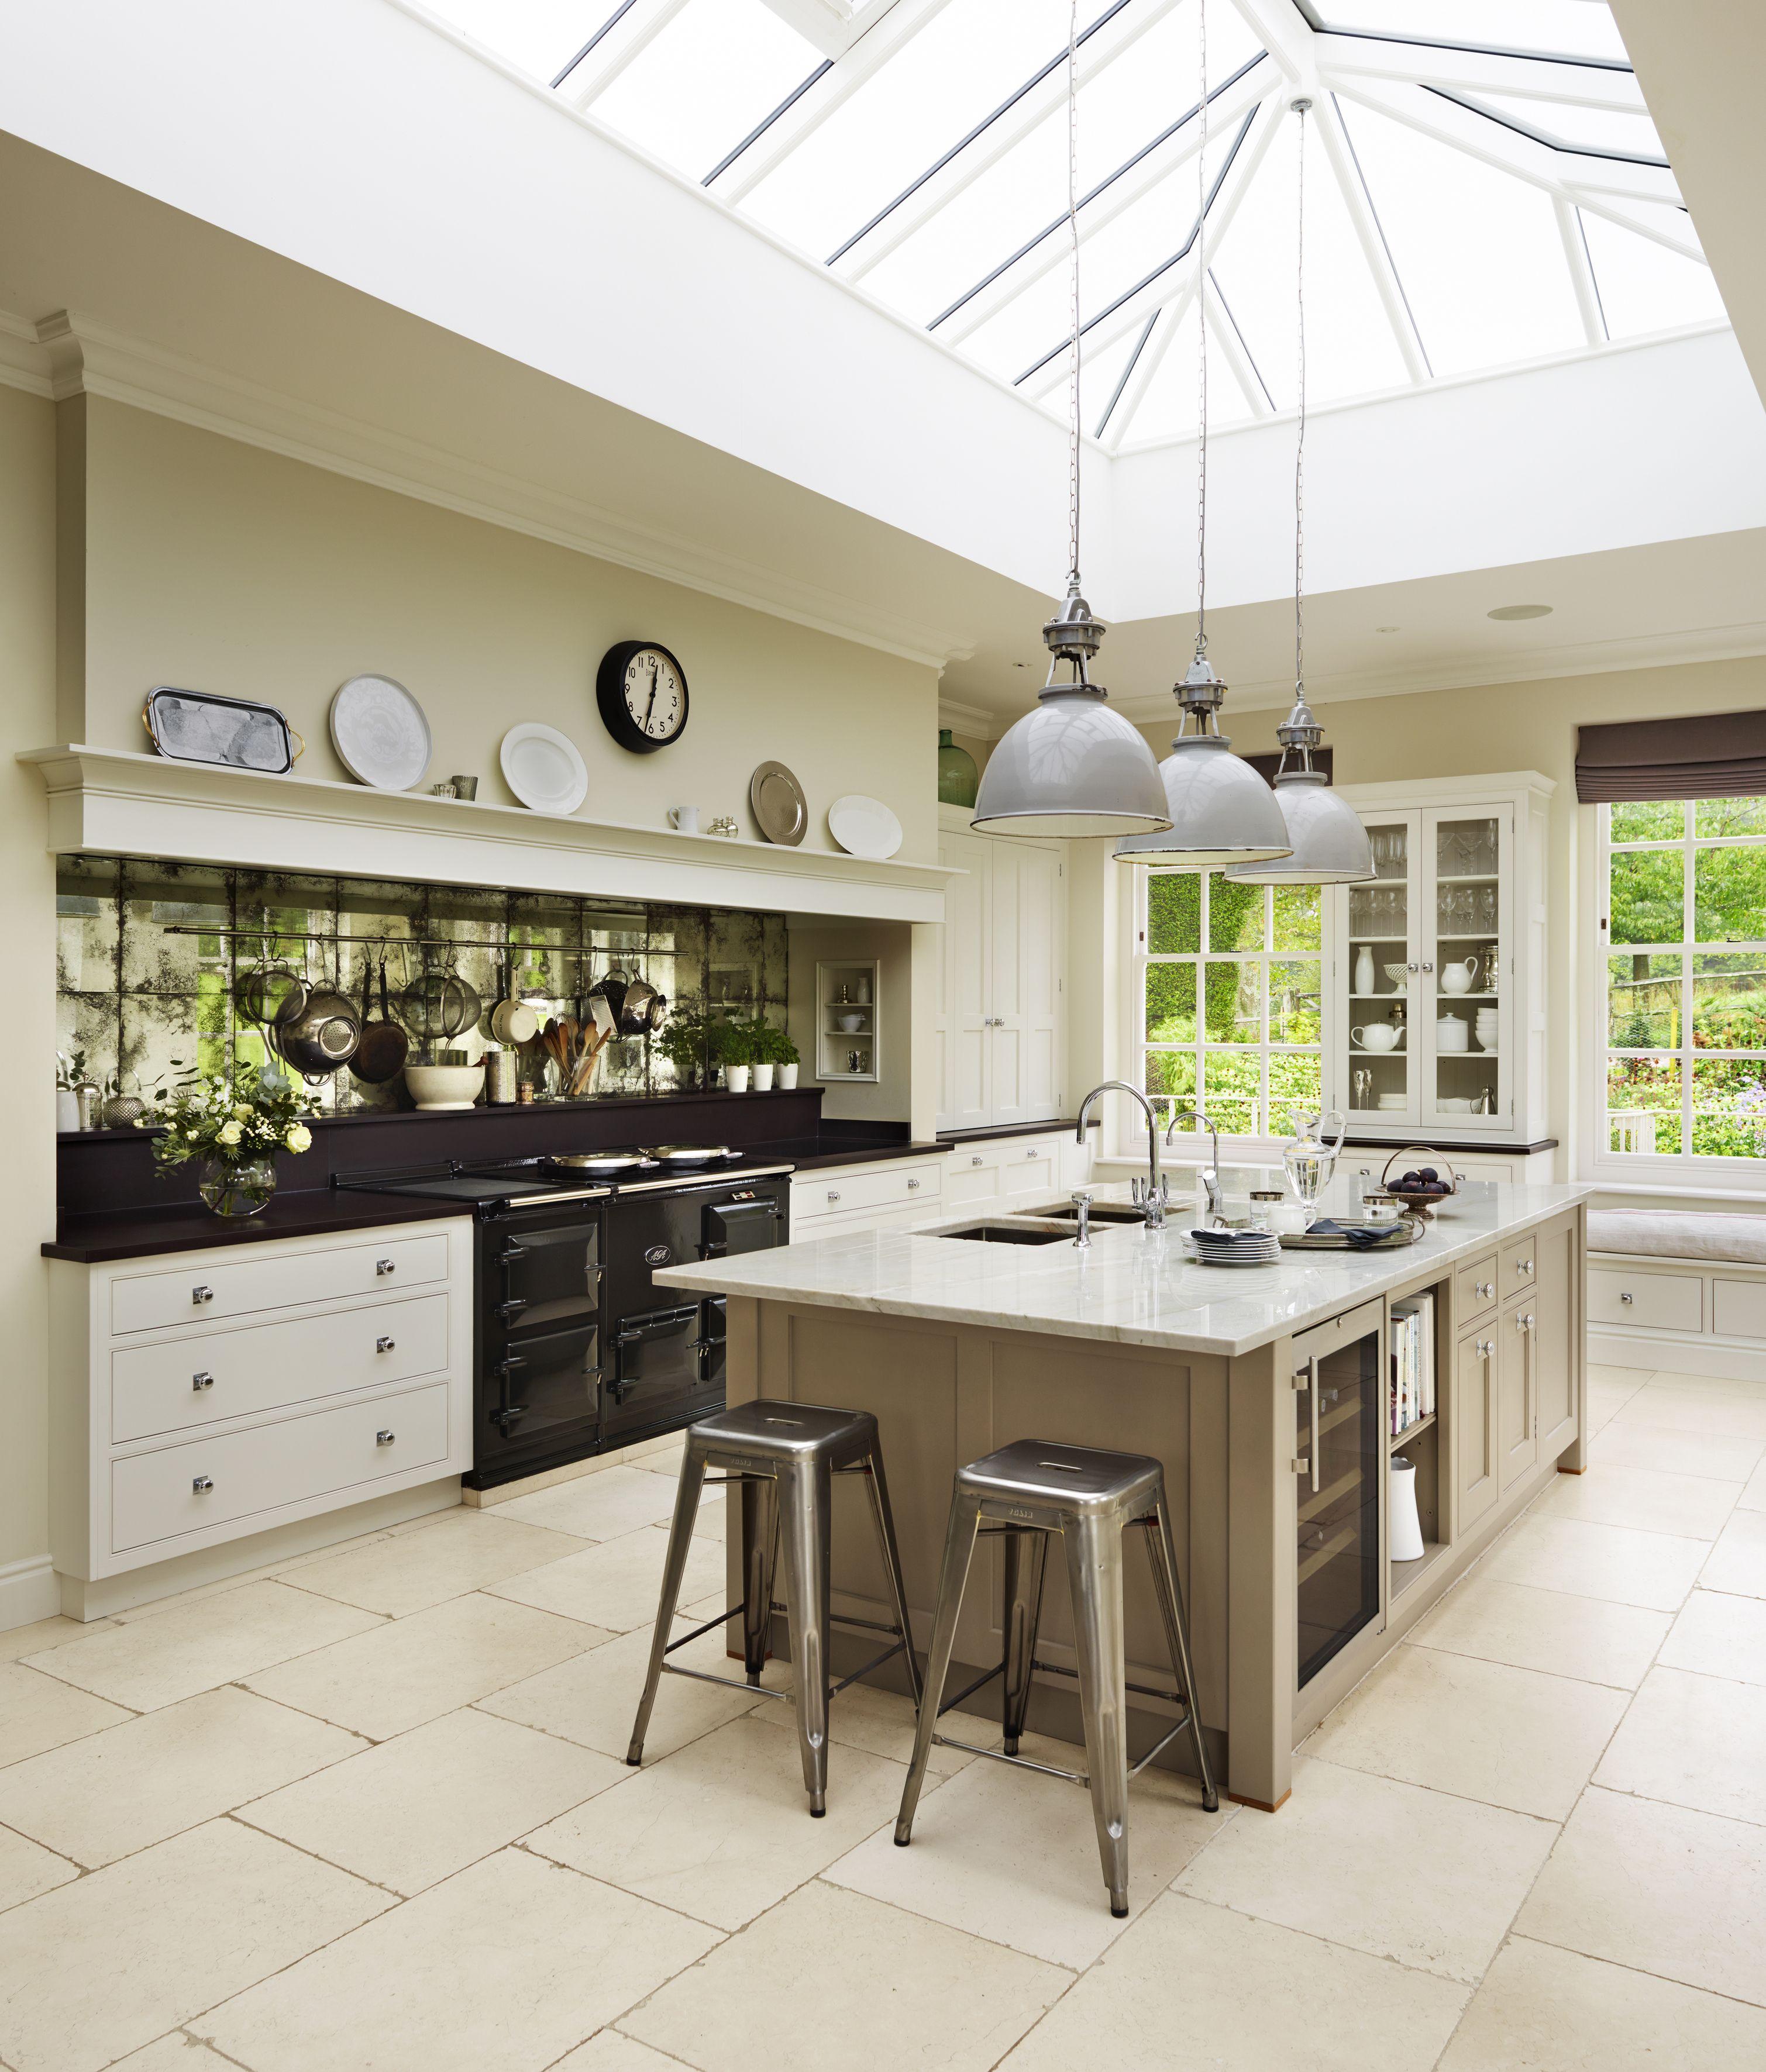 Bespoke Martin Moore kitchen with antiqued mirror glass splashback ...